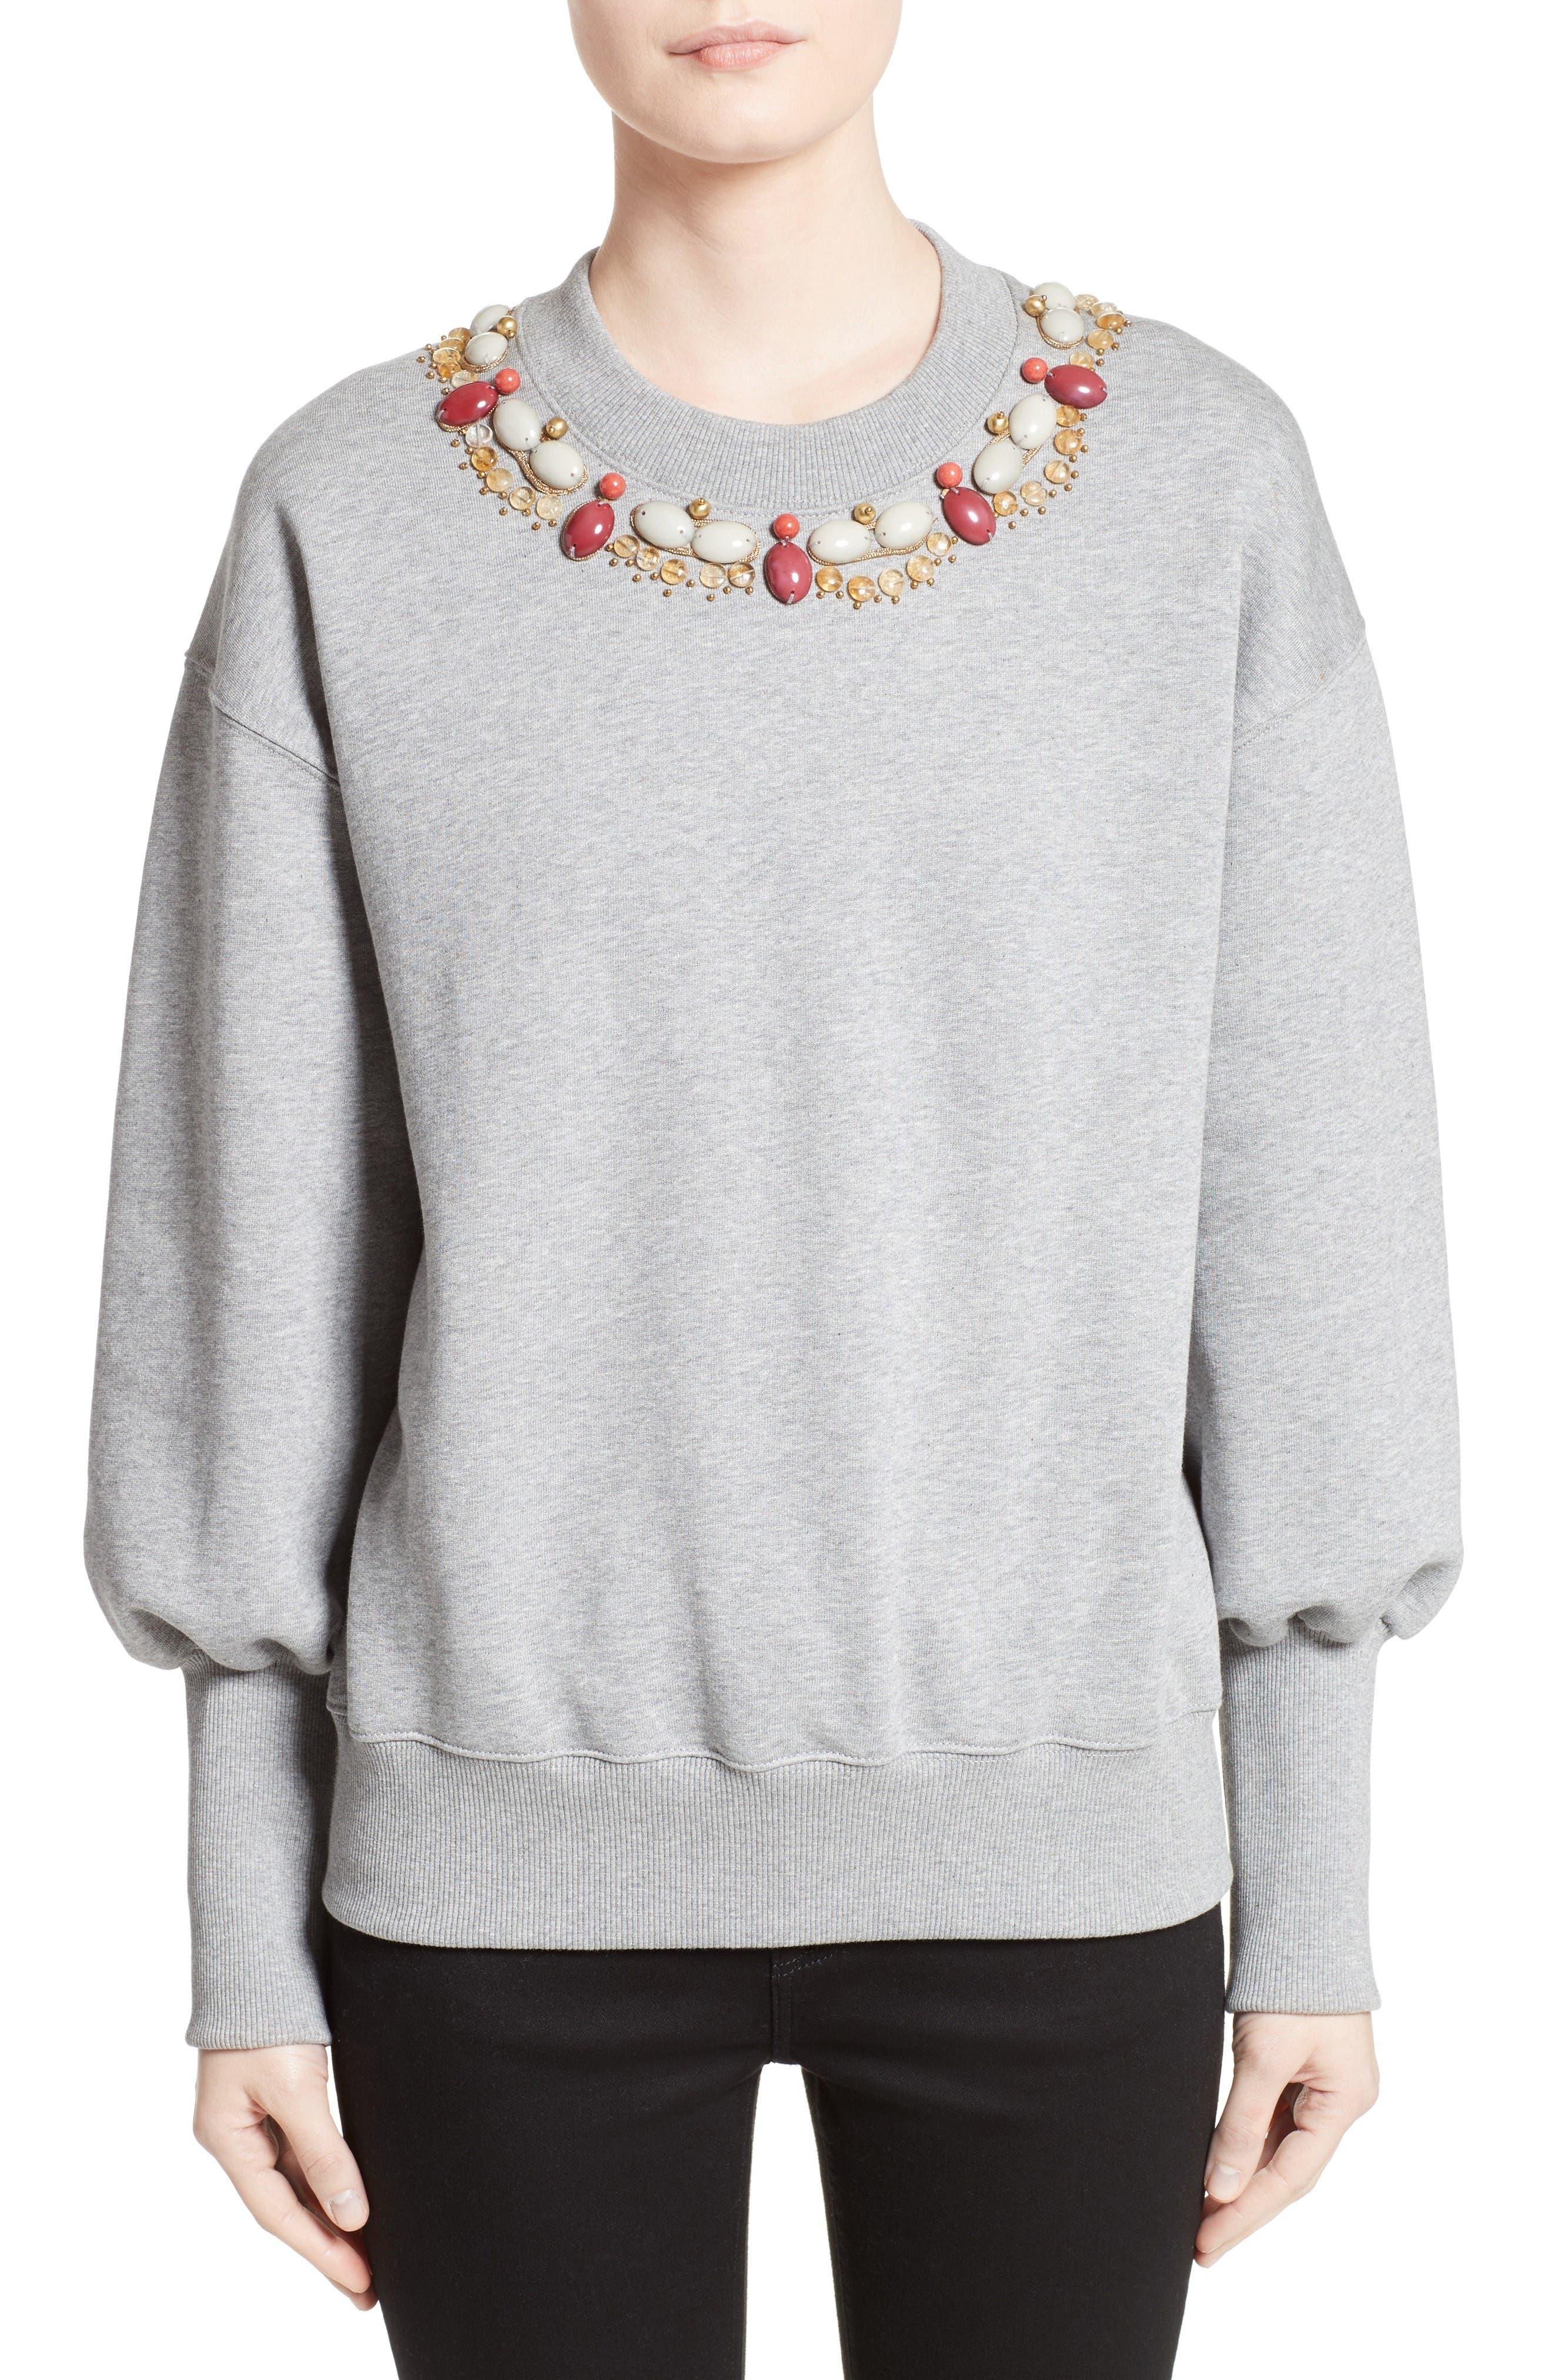 Juliano Embellished Sweatshirt,                         Main,                         color, Pale Grey Melange